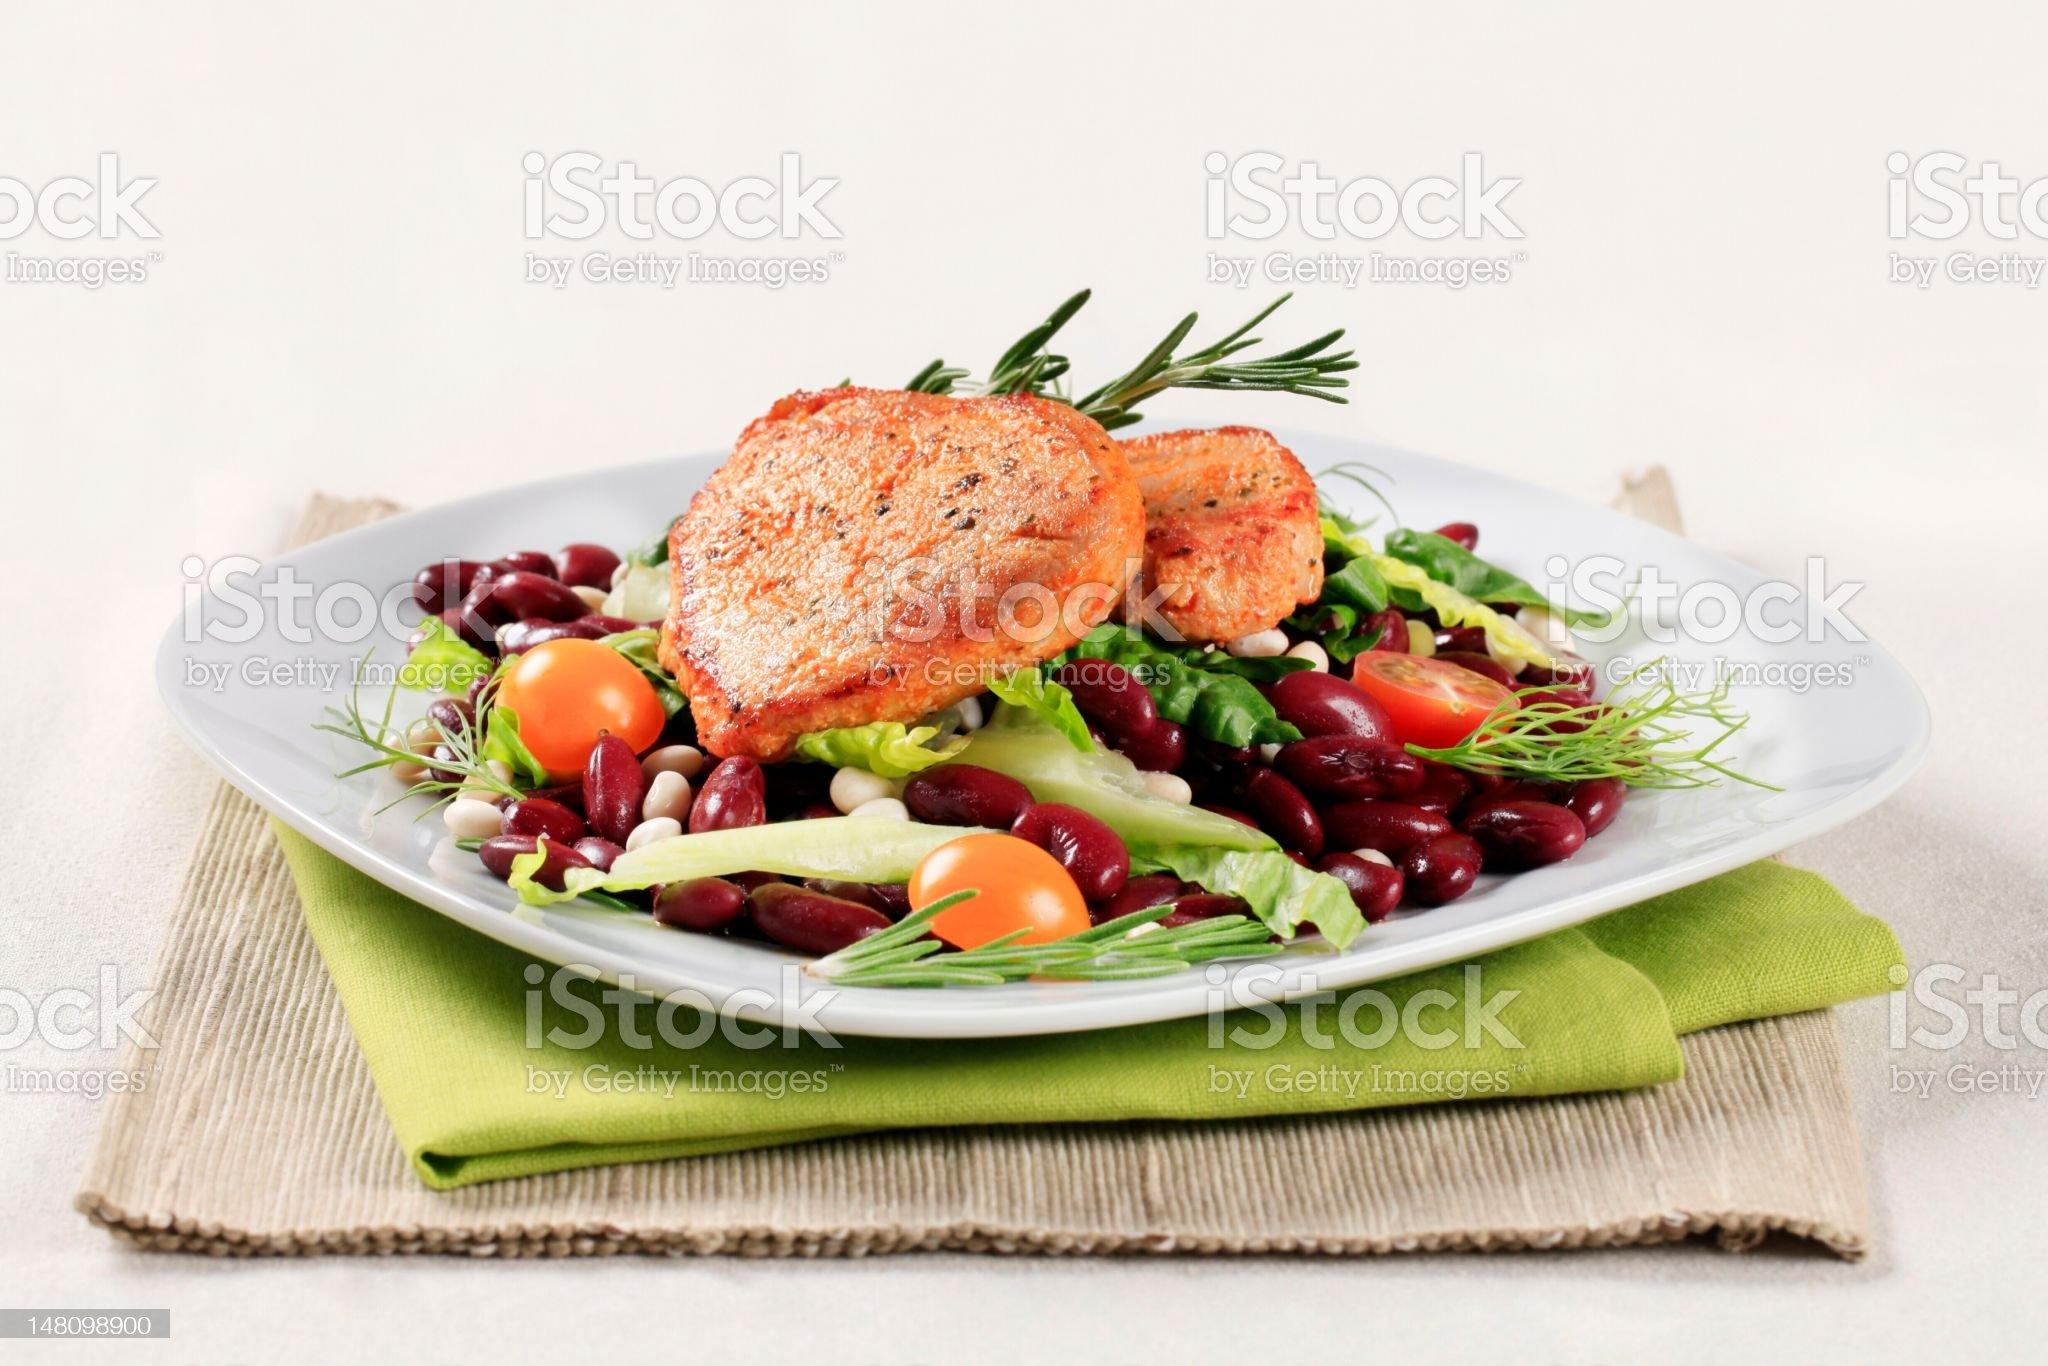 Marinated pork and red bean salad royalty-free stock photo